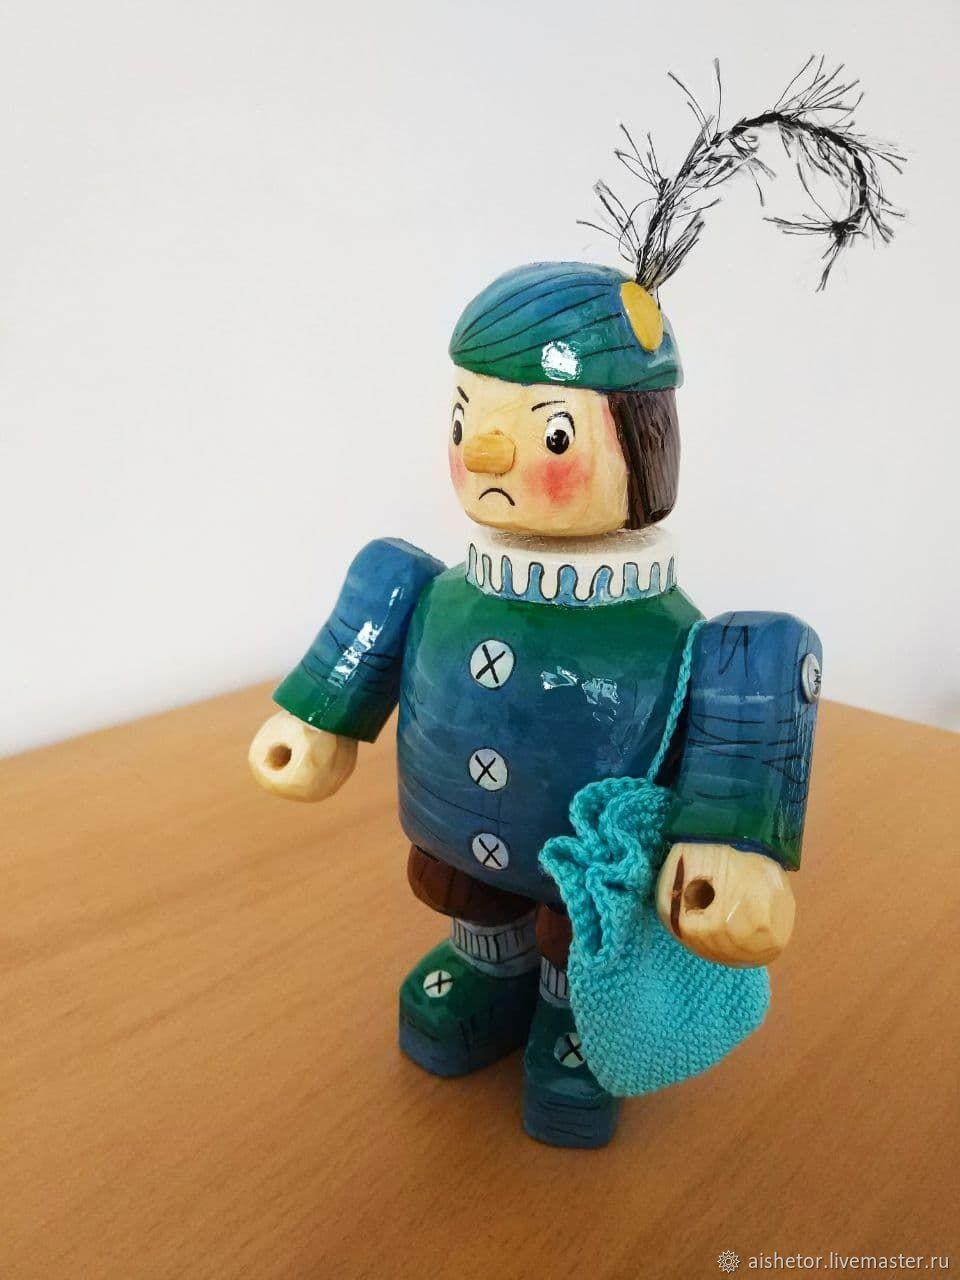 Cabr Gwyn wooden toy, Miniature figurines, Moscow,  Фото №1